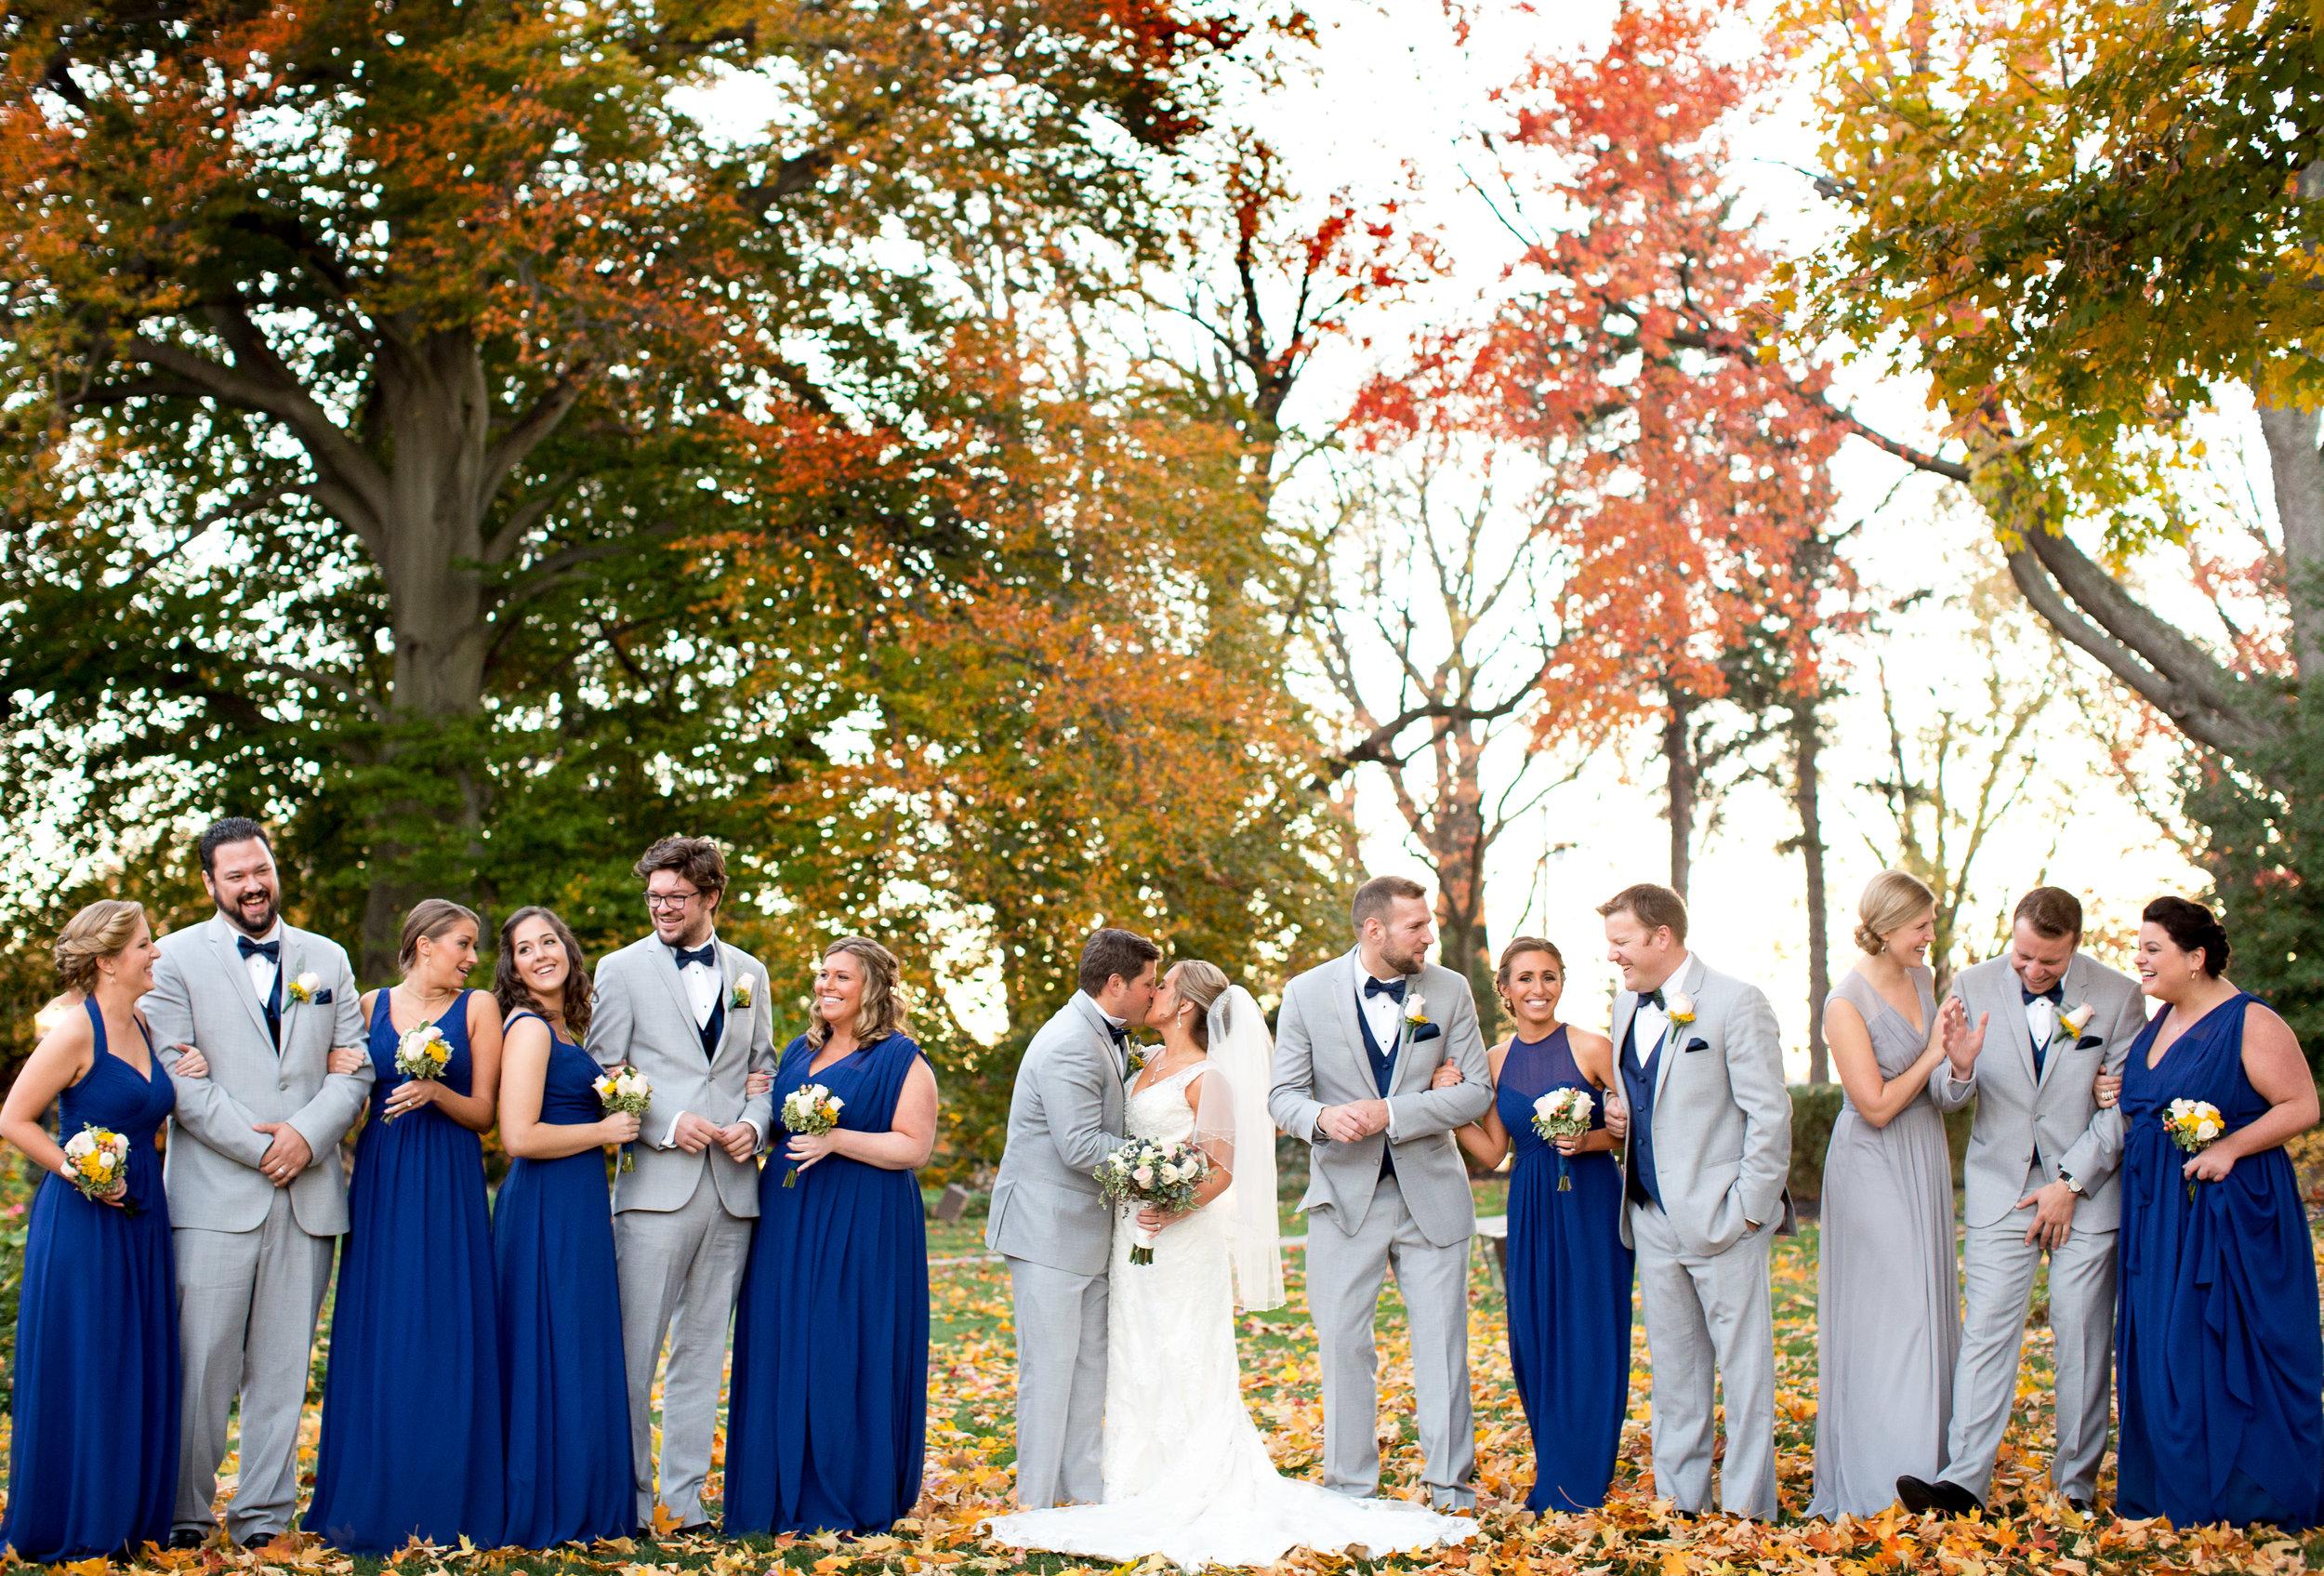 Weick-Watkinson Wedding_2118.jpg